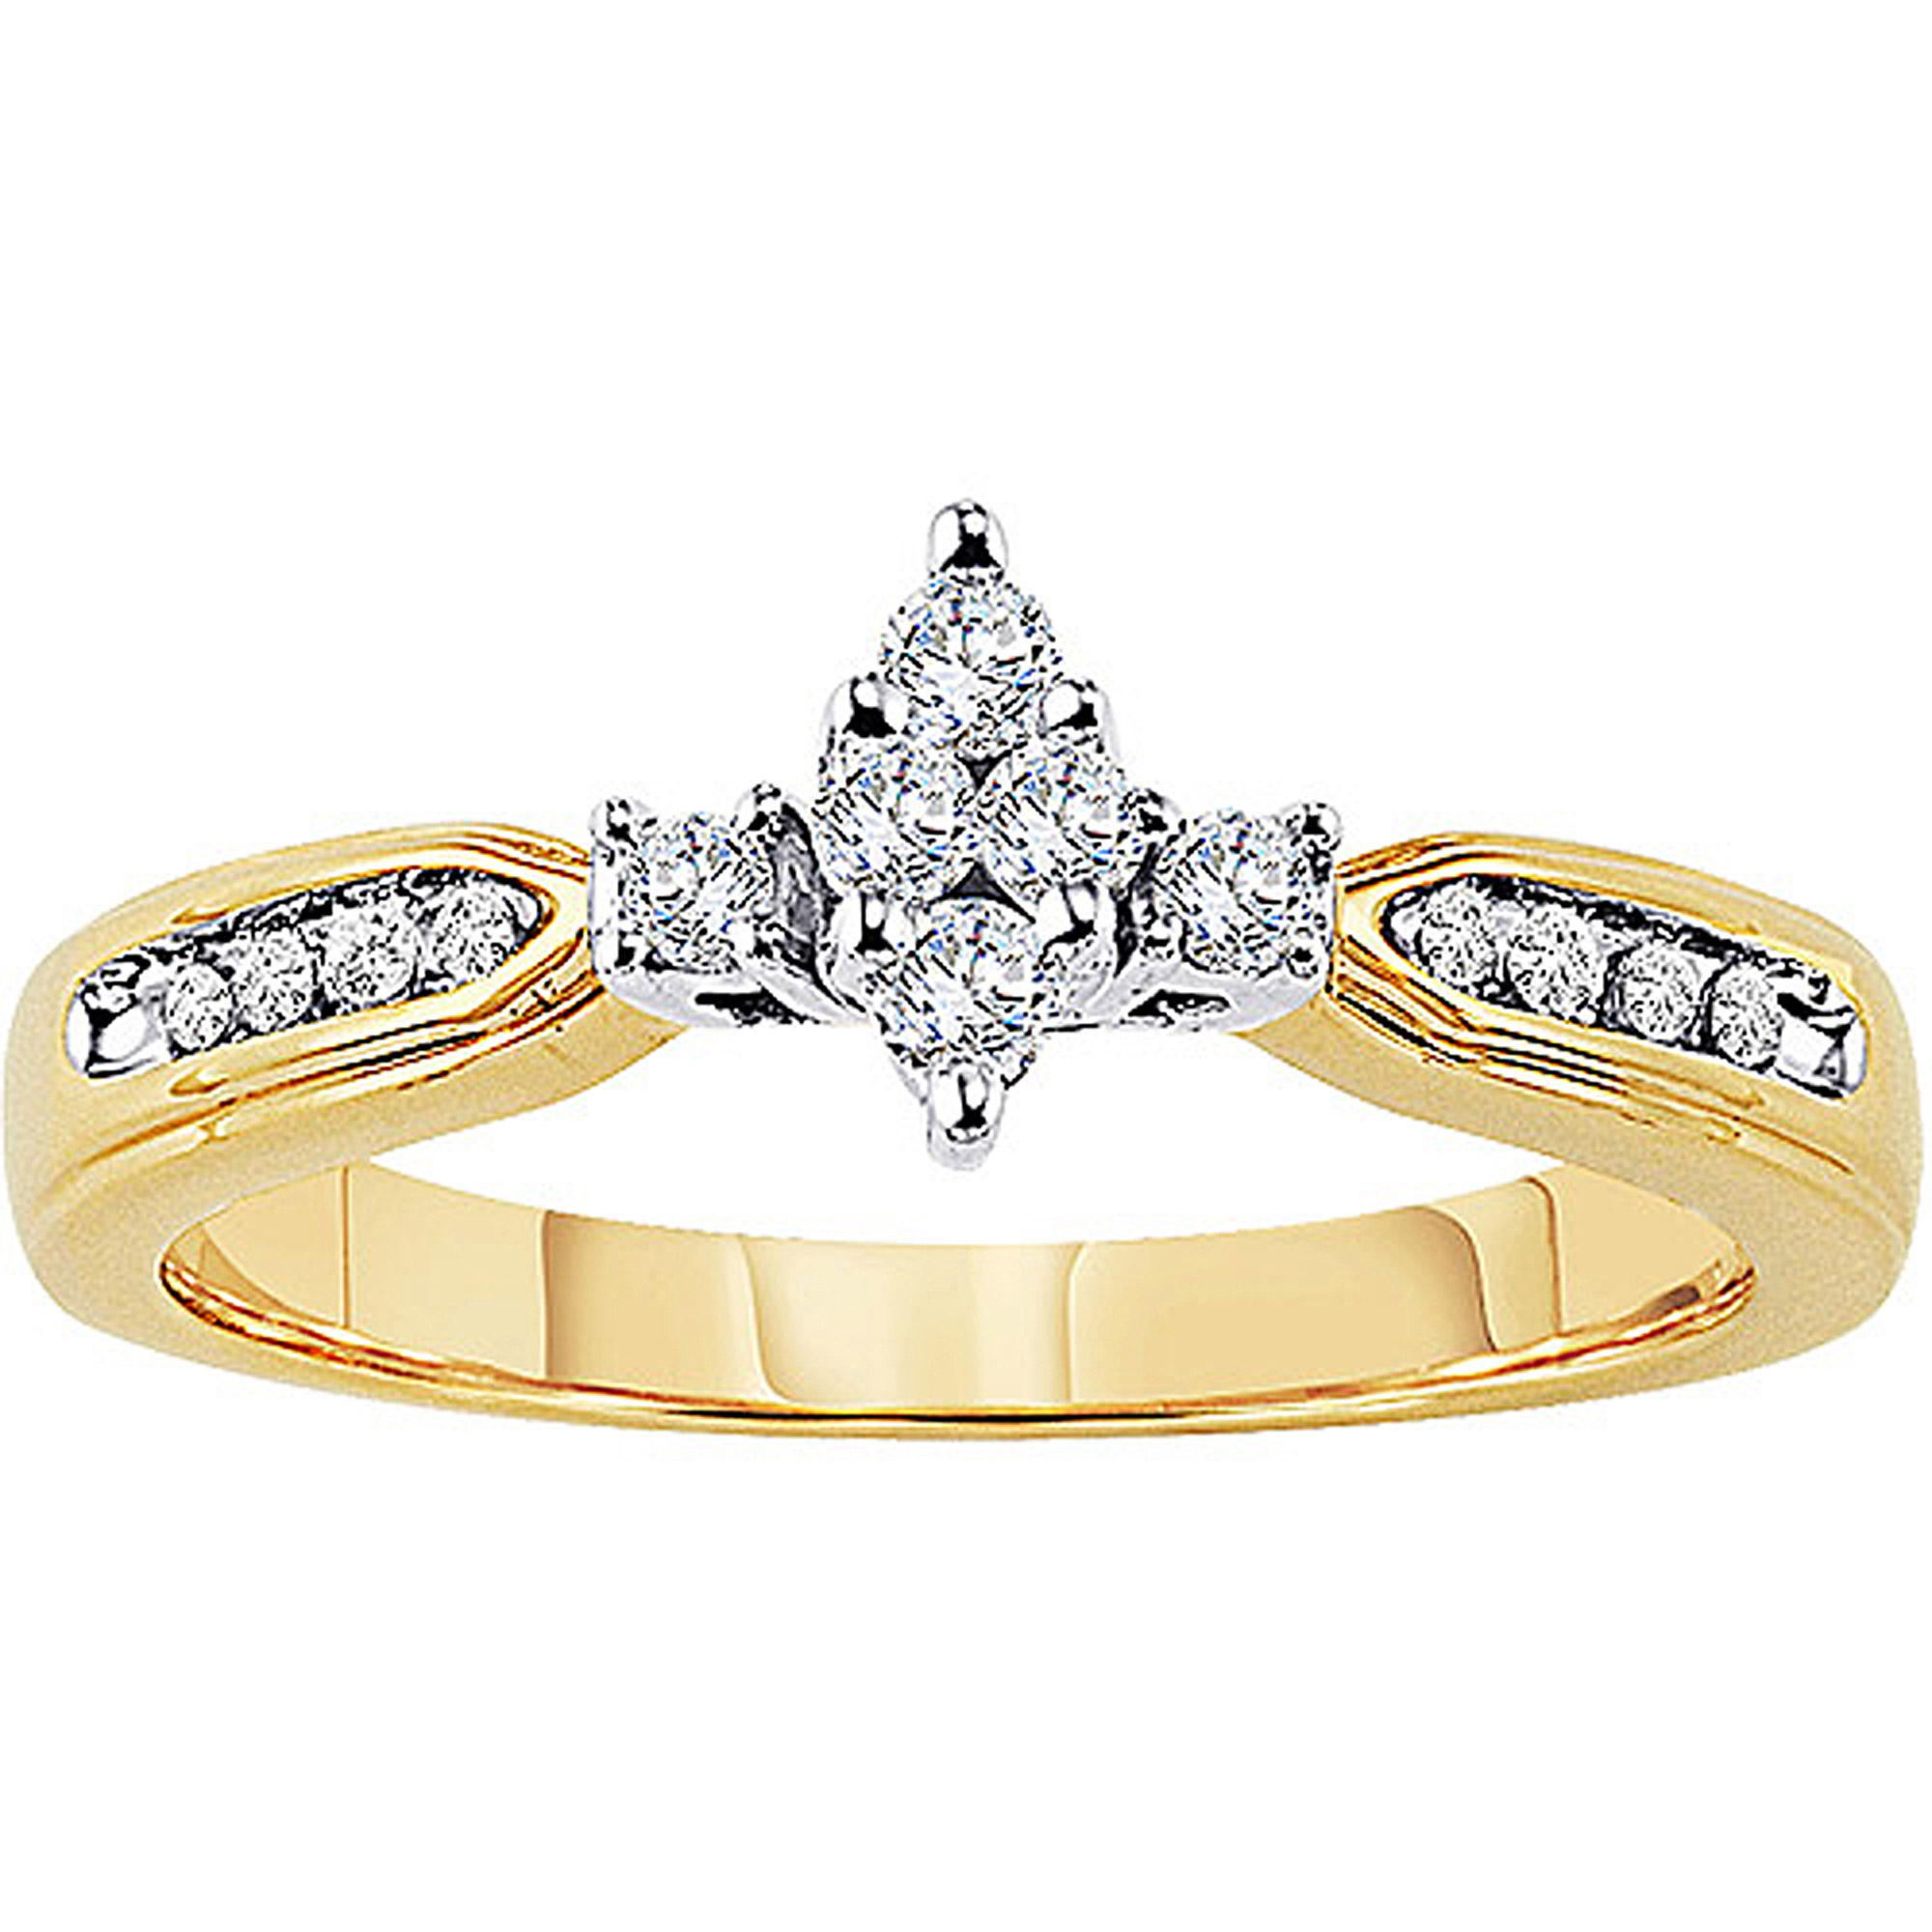 Keepsake Lovelight 1/4 Carat T.W. Certified Diamond 10kt Yellow Gold Engagement Ring